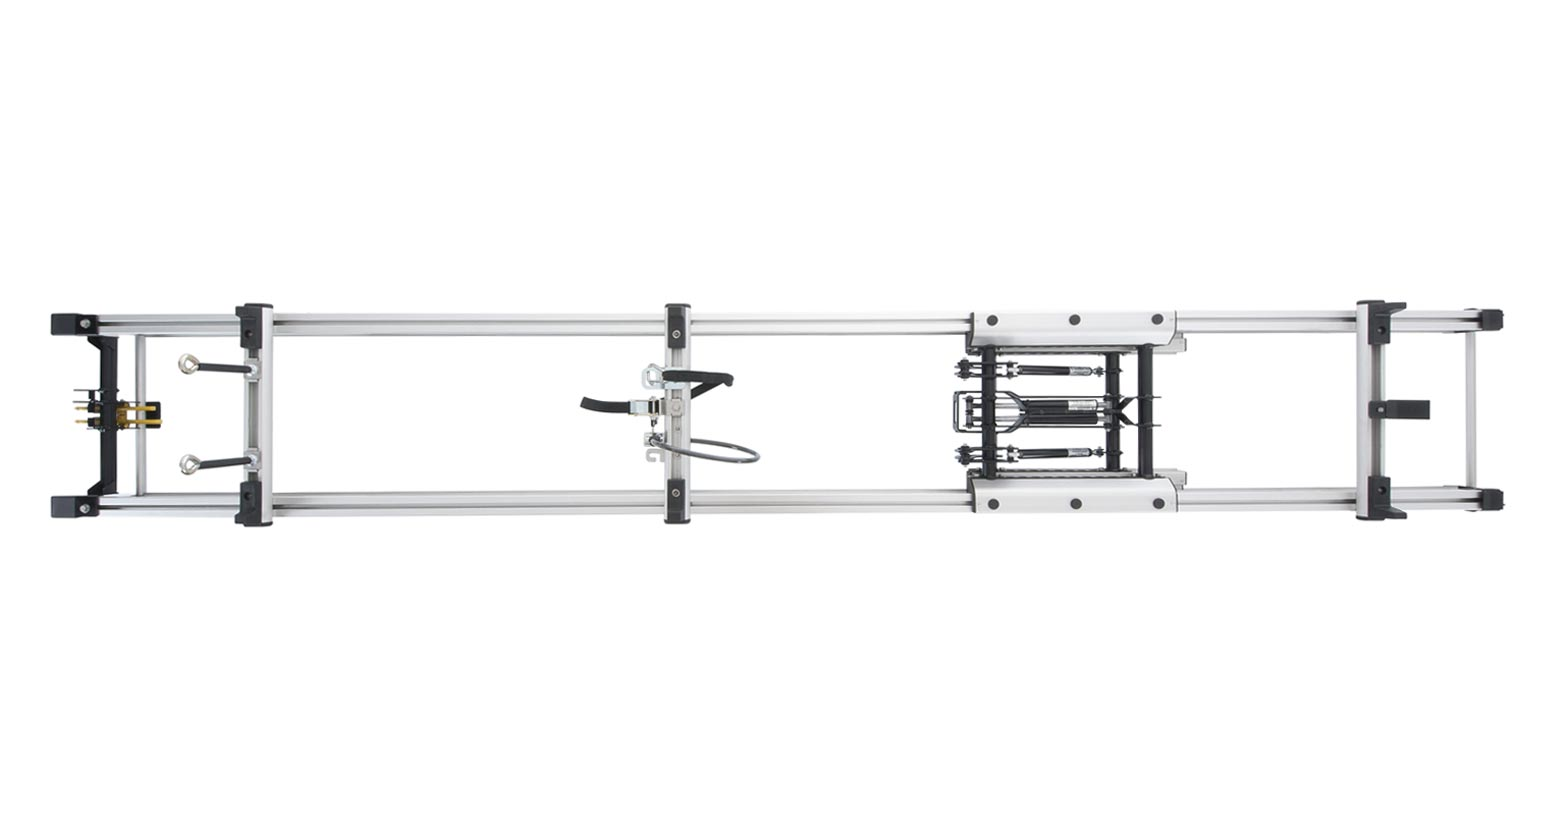 Ja0473 Ohs Step Ladder Loader System Rhino Rack